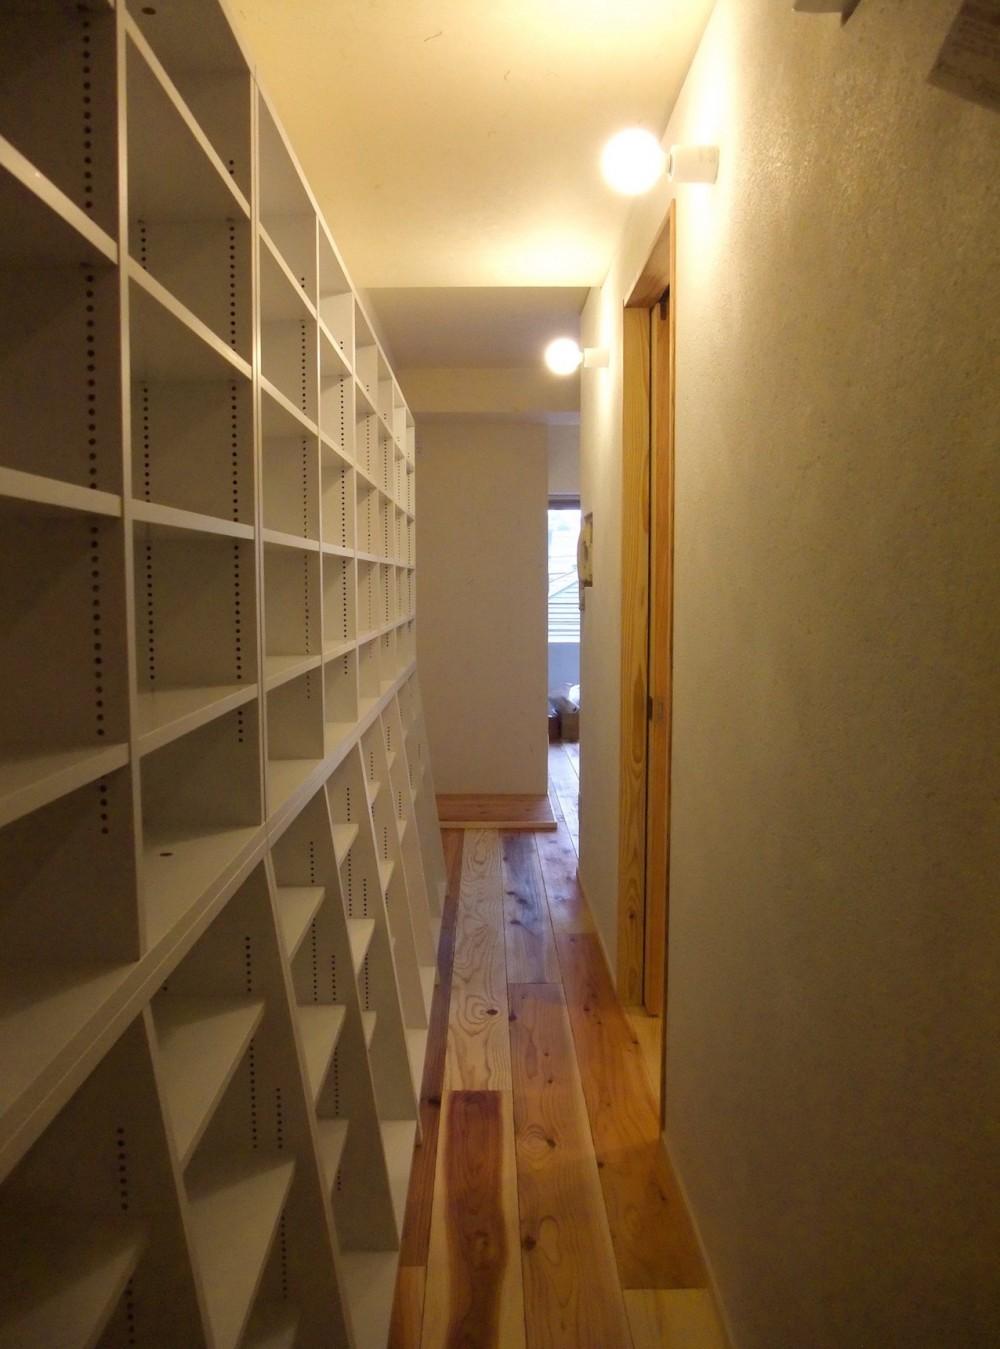 Edelweiss renovation 〜 ふたり暮らしのリノベーション 〜 (パントリー的壁面収納のある小道02)